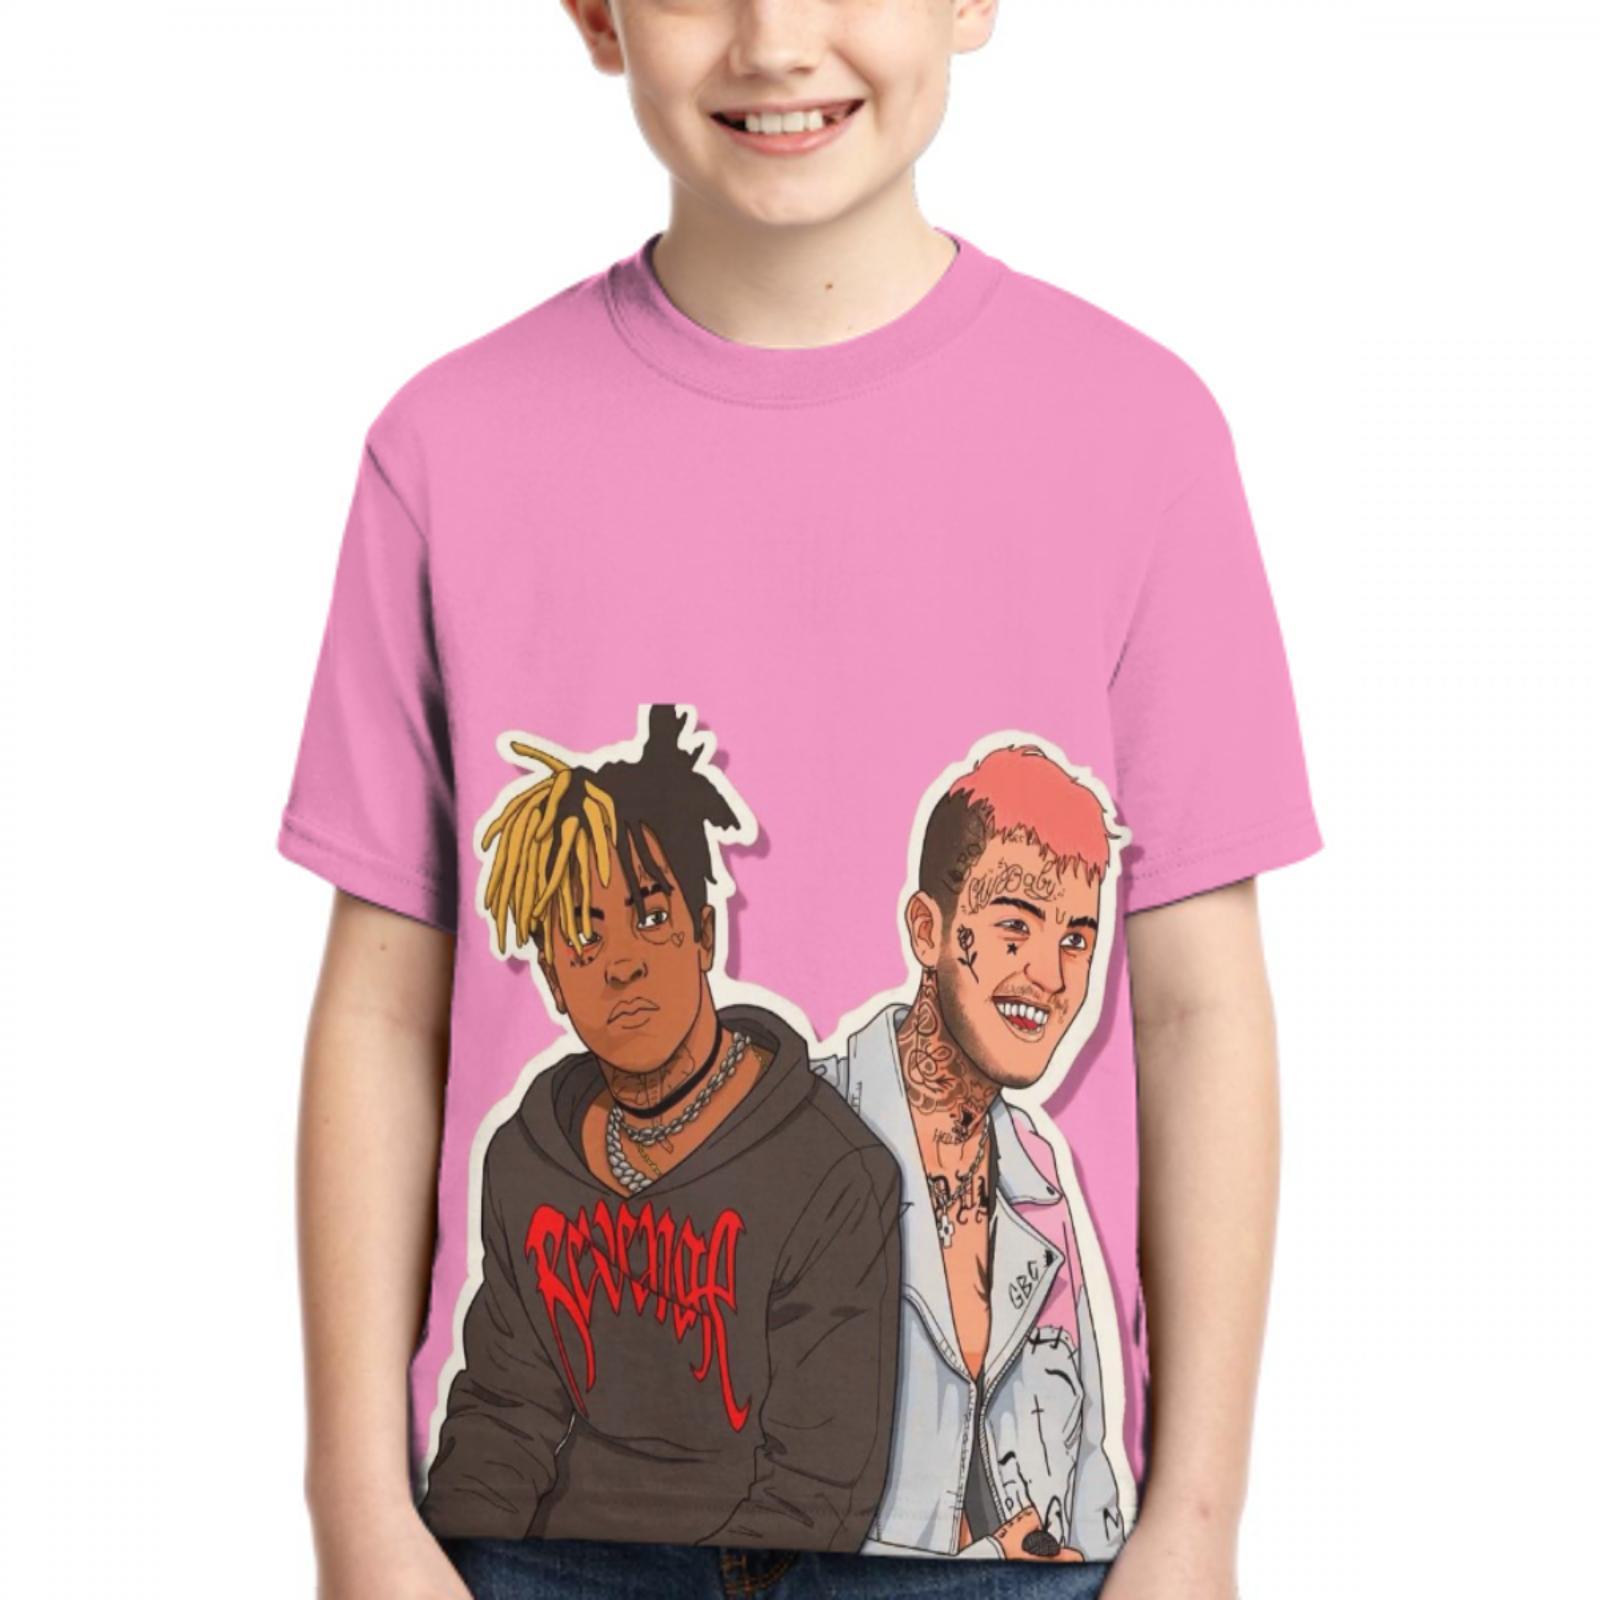 Camisa dos meninos/meninas t da forma da camisa dos meninos/meninas do telefone do peep do lil